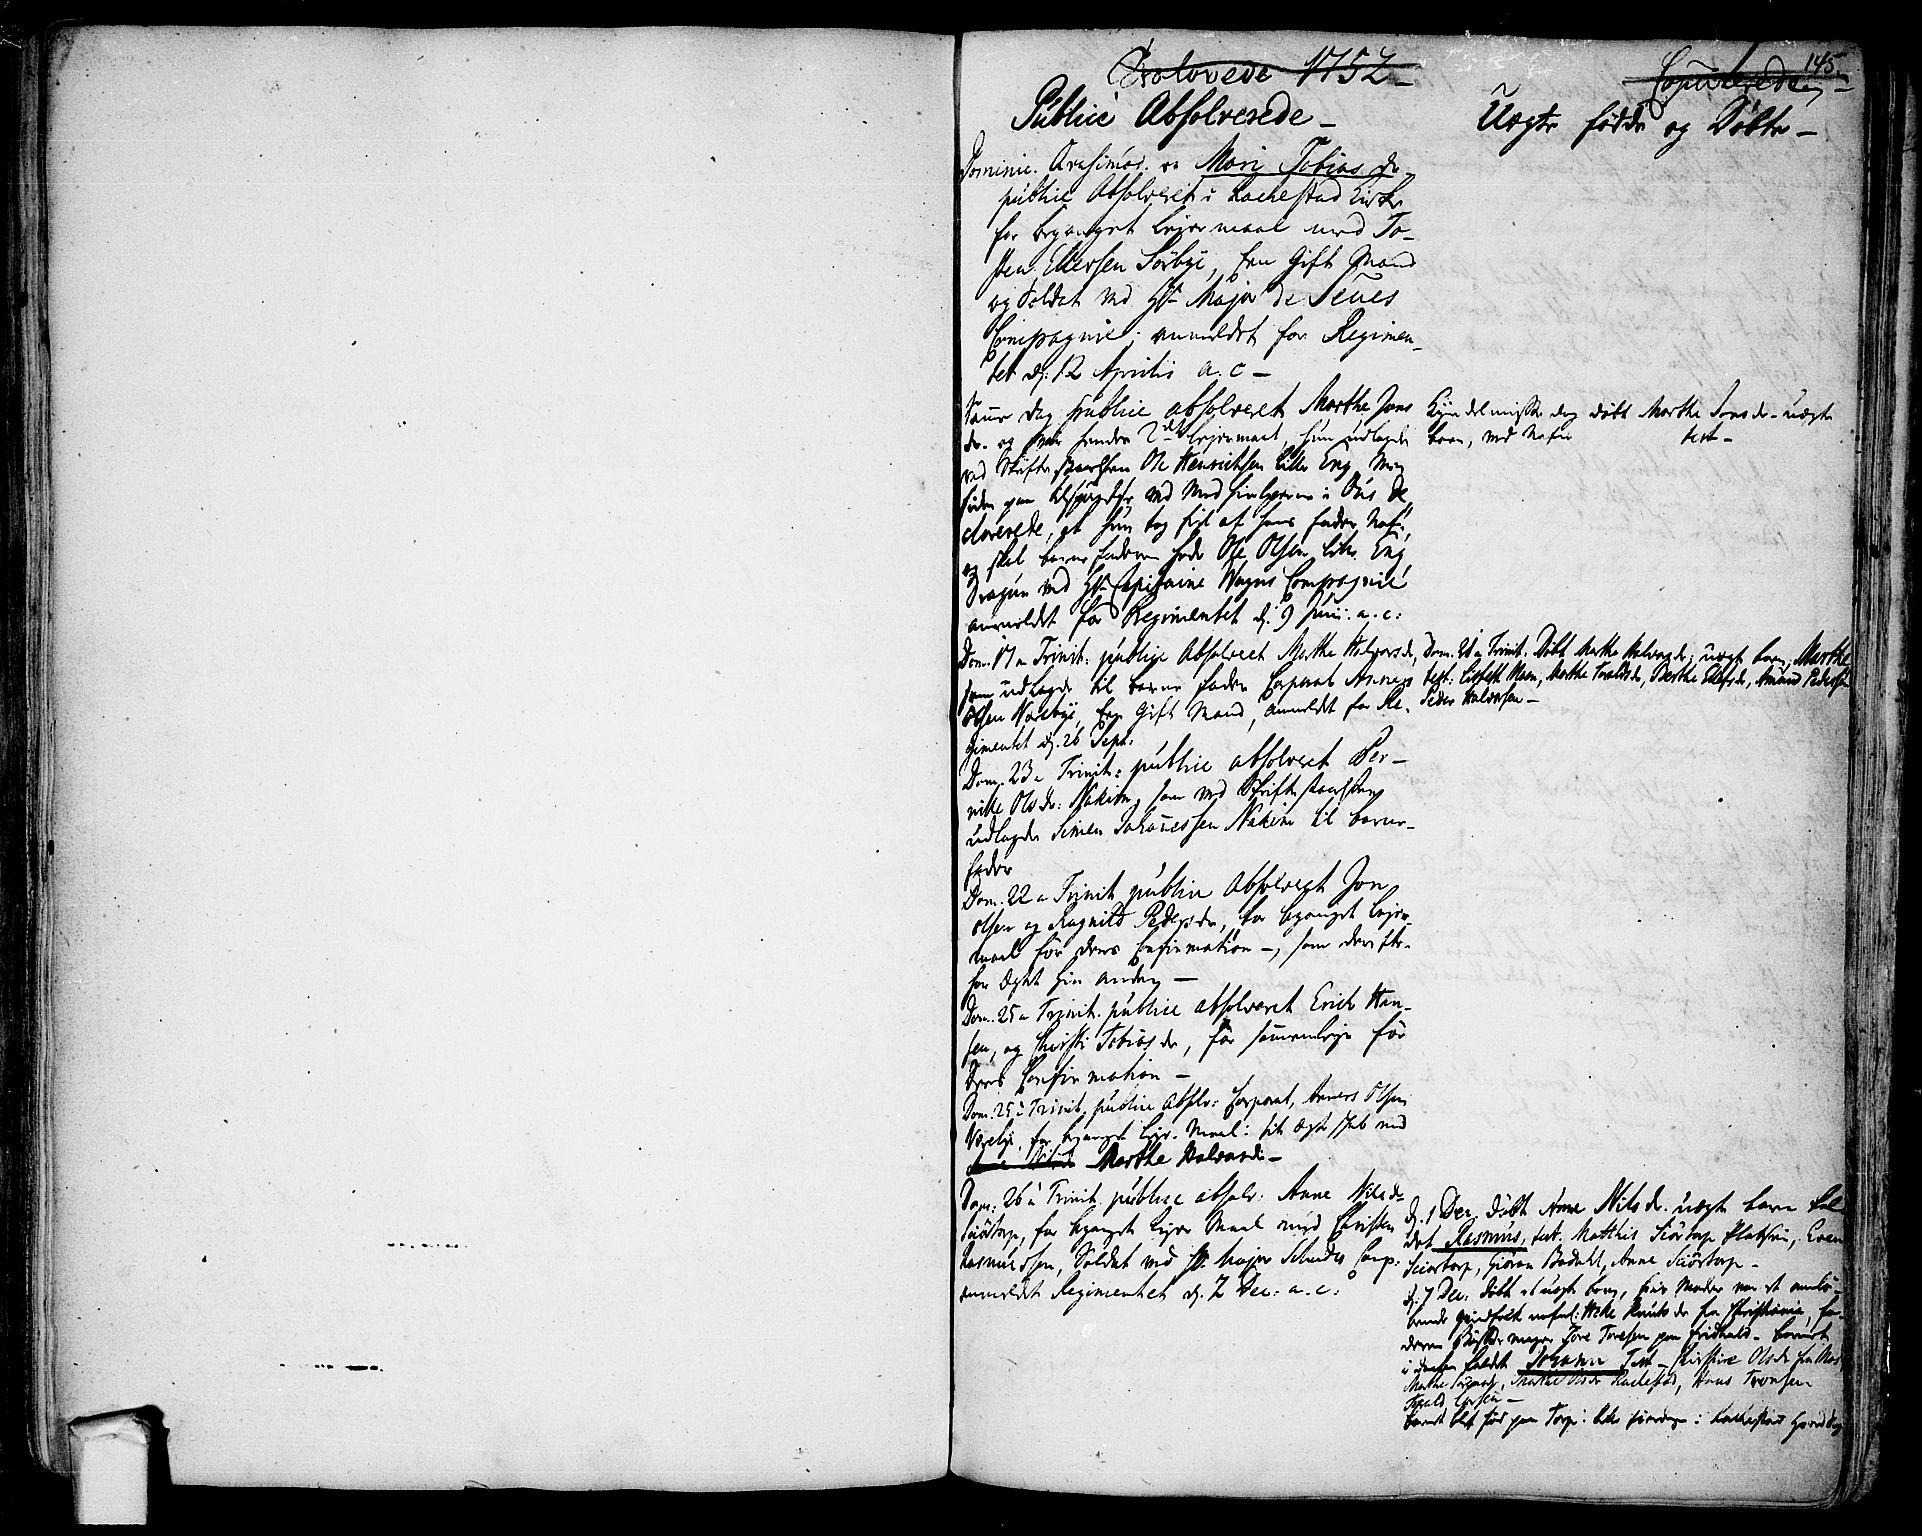 SAO, Rakkestad prestekontor Kirkebøker, F/Fa/L0003: Ministerialbok nr. I 3, 1752-1777, s. 145